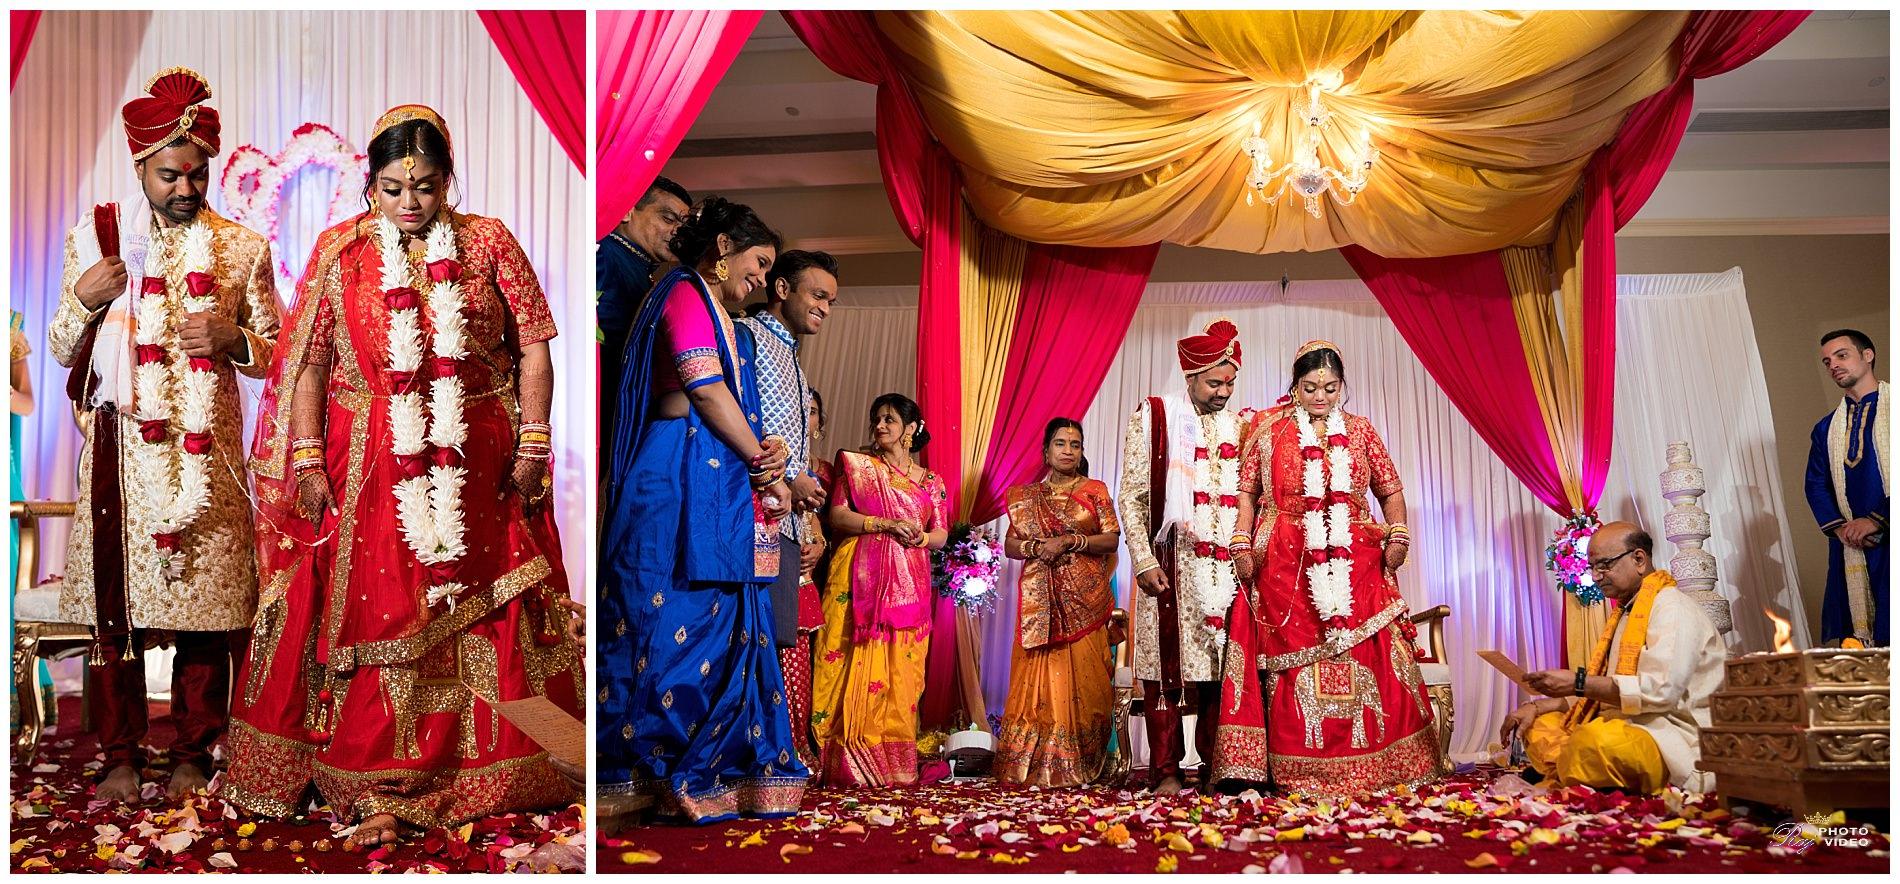 doubletree-by-hilton-hotel-wilmington-de-wedding-krishna-ritesh-68.jpg